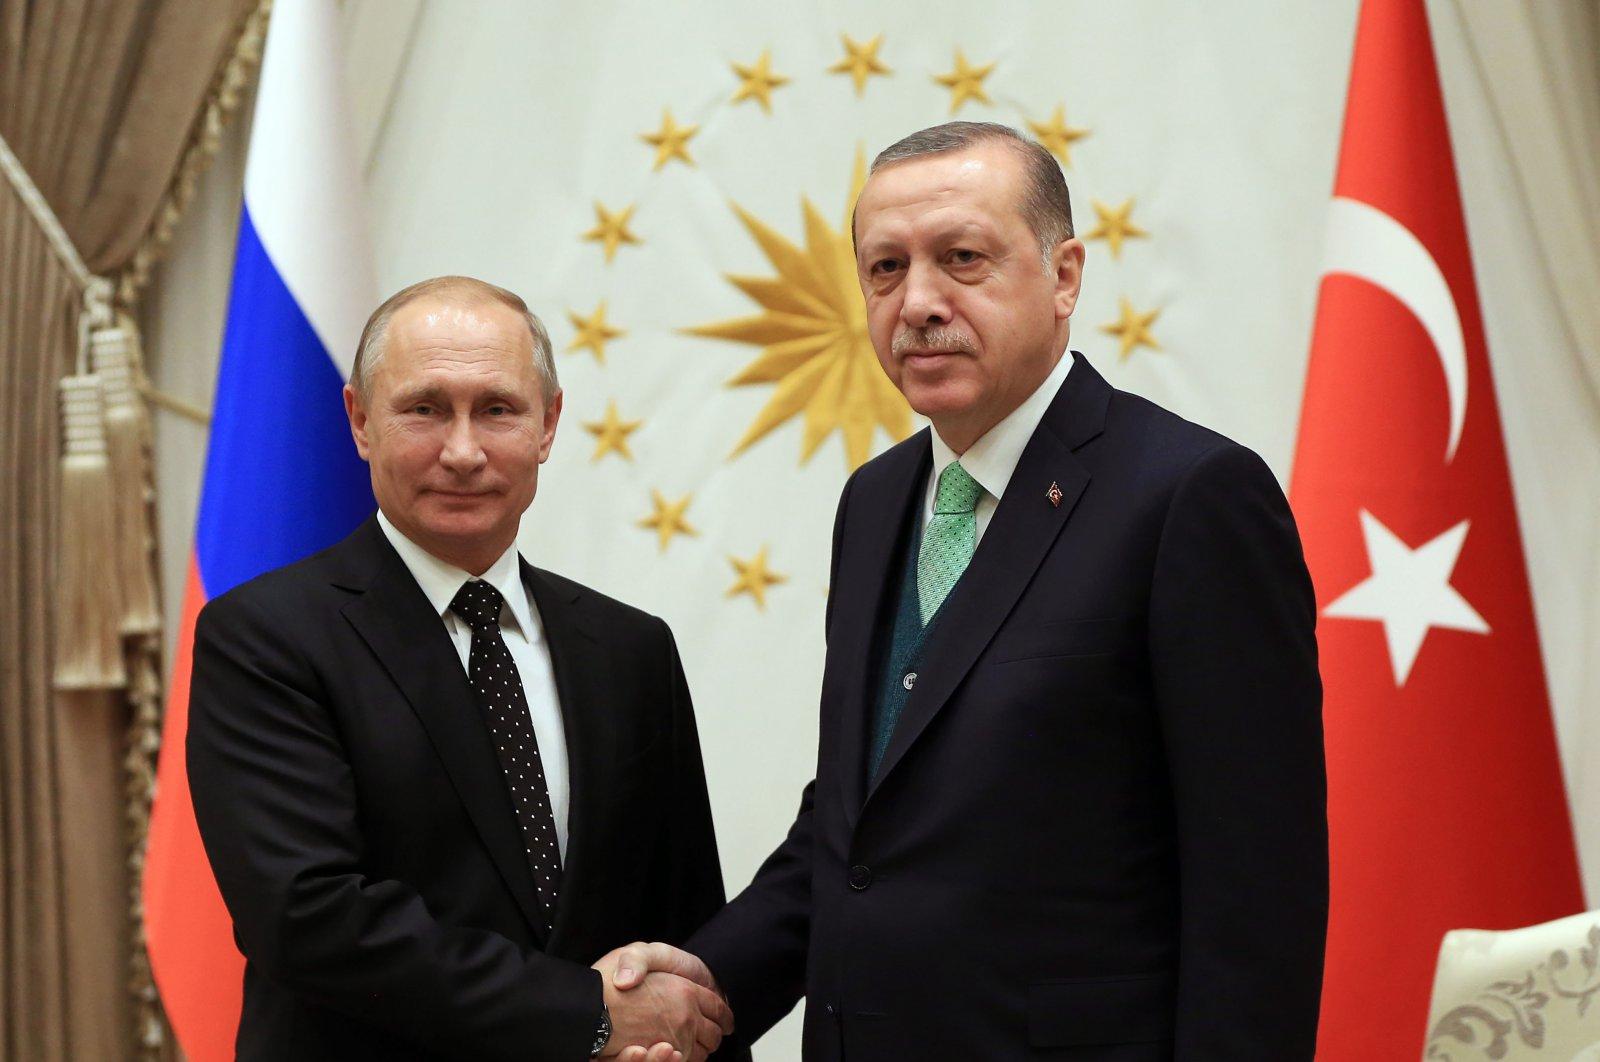 Presidents Erdoğan and Putin during a meeting in the Presidential Complex, Ankara, Turkey, Nov. 12, 2017. (AA File Photo)